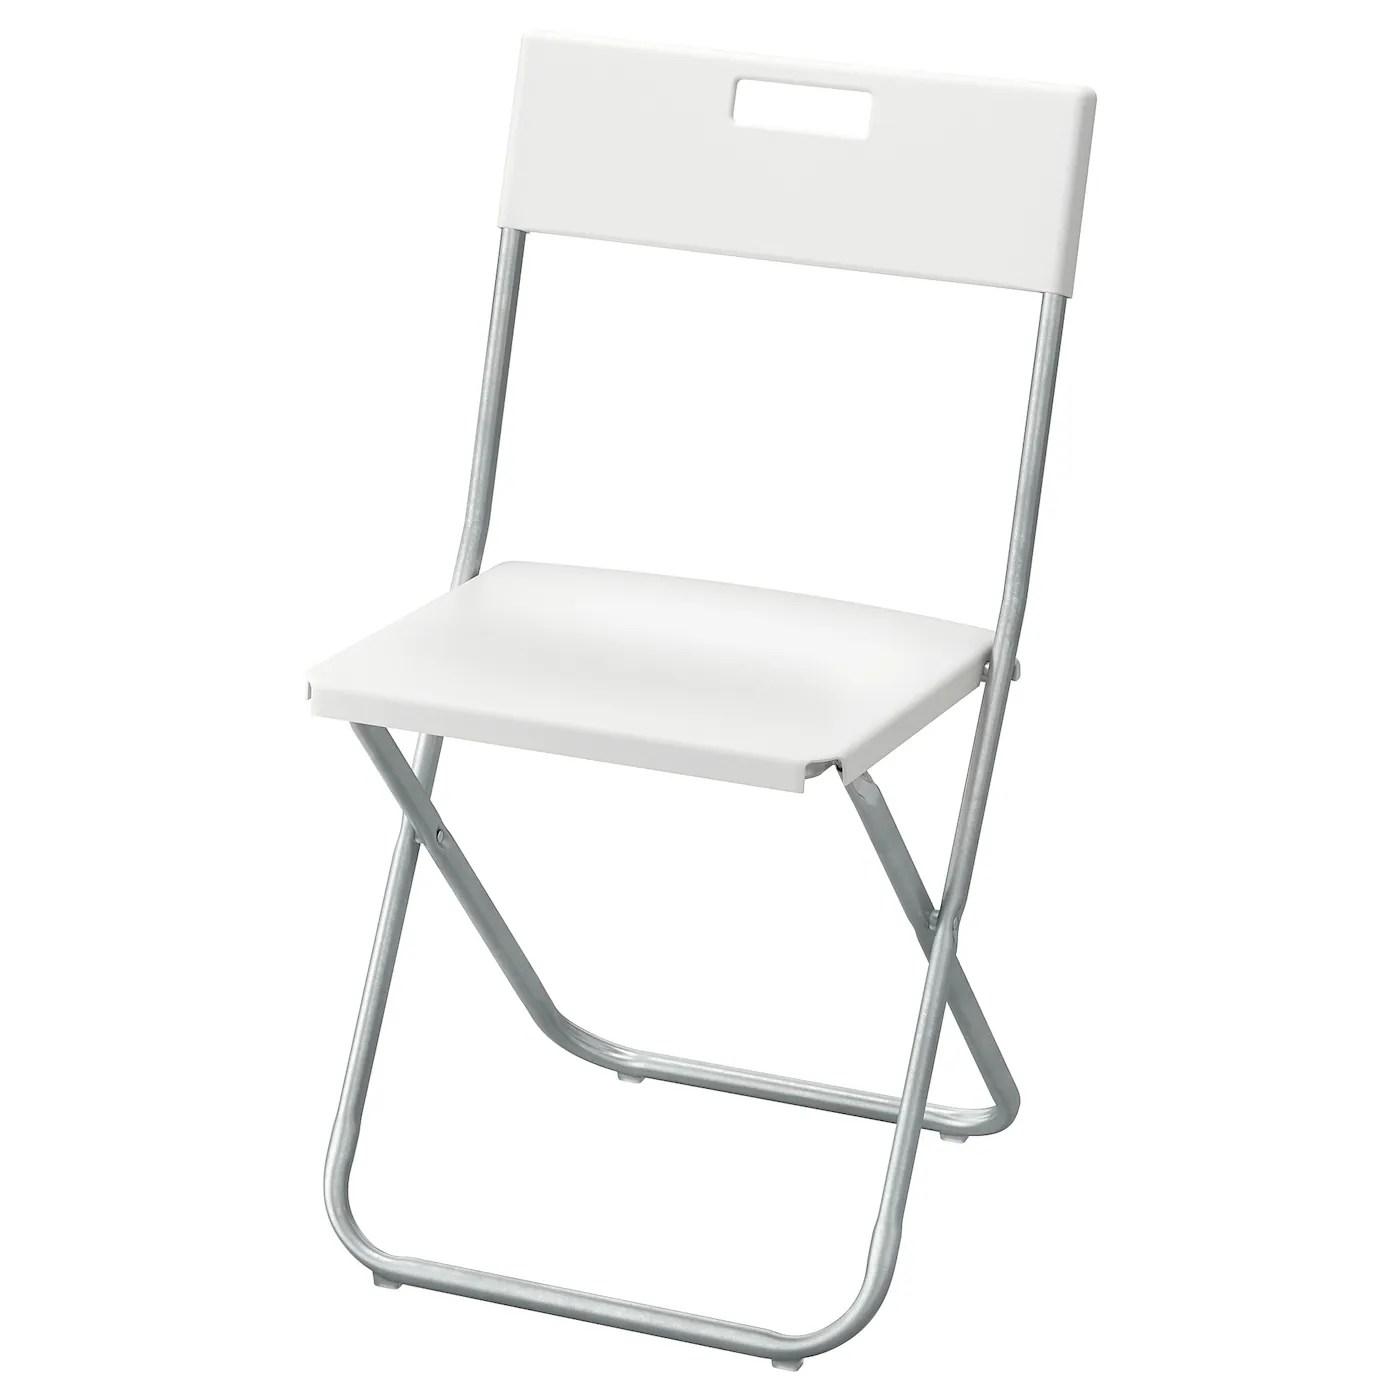 Chaise Pliante Ikea Gunde Blanc Fournitures Educatives Co Commerce Industrie Et Science